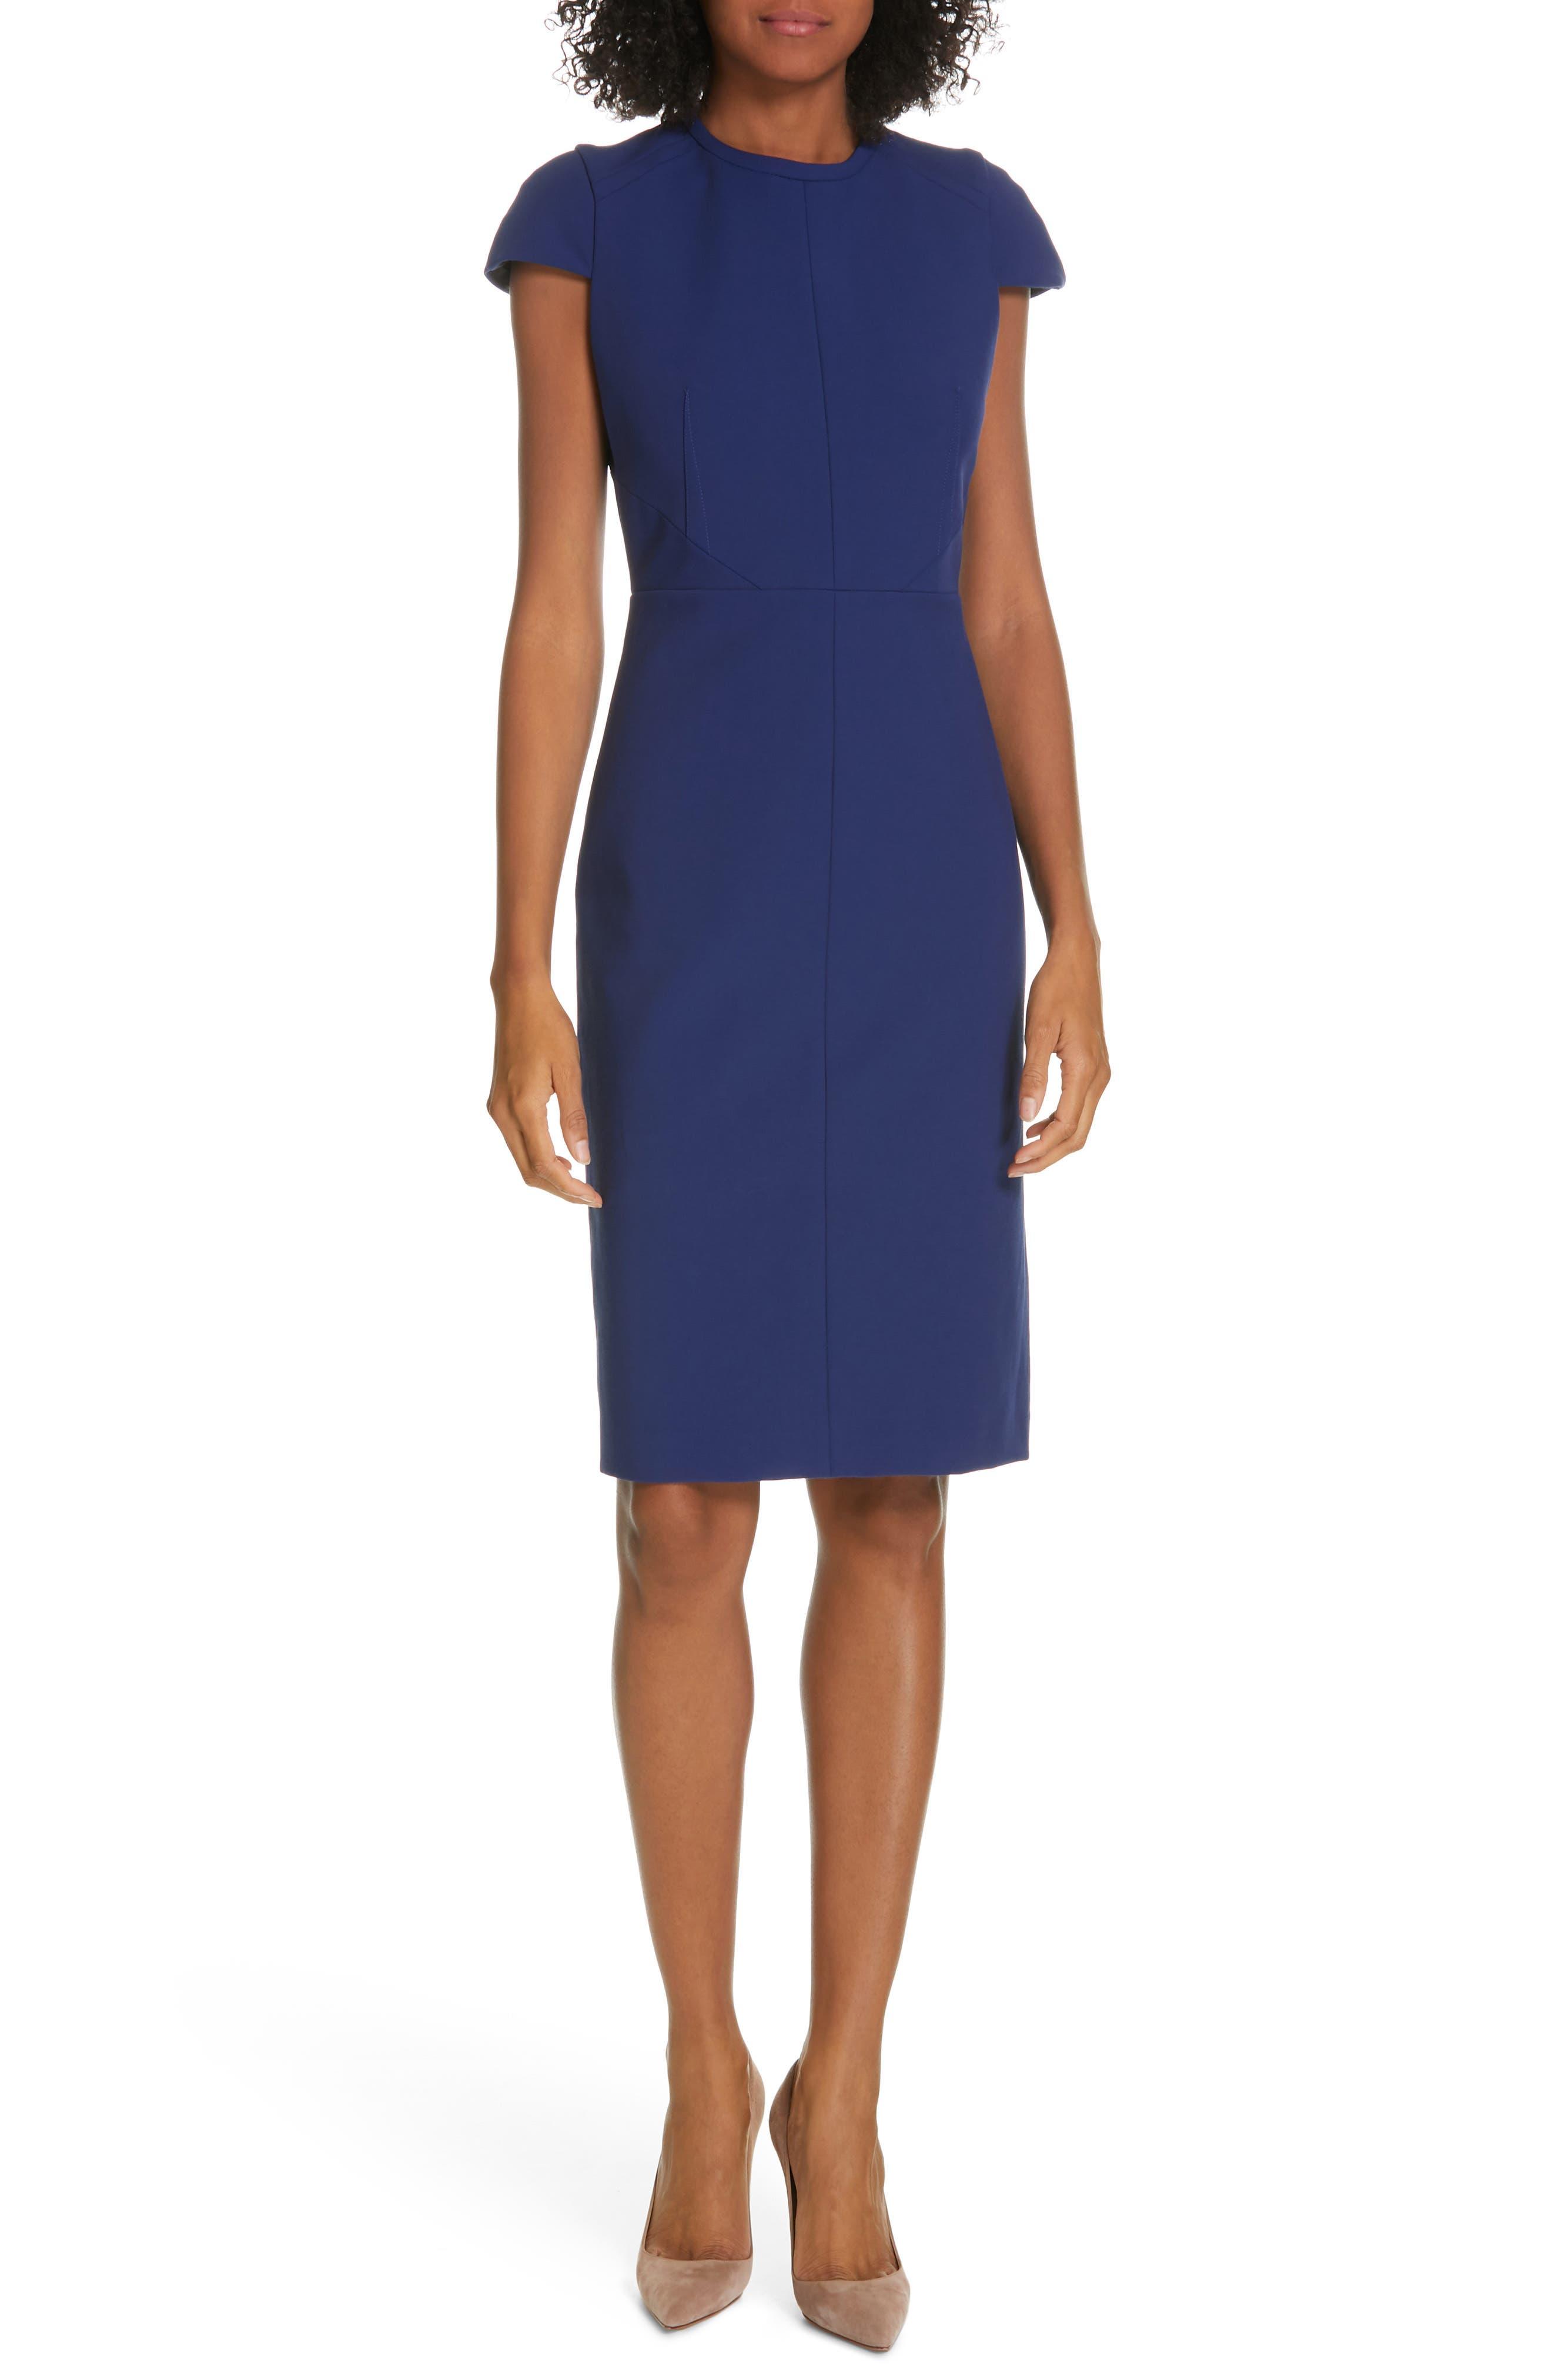 Judith & Charles Moss Sheath Dress, Blue